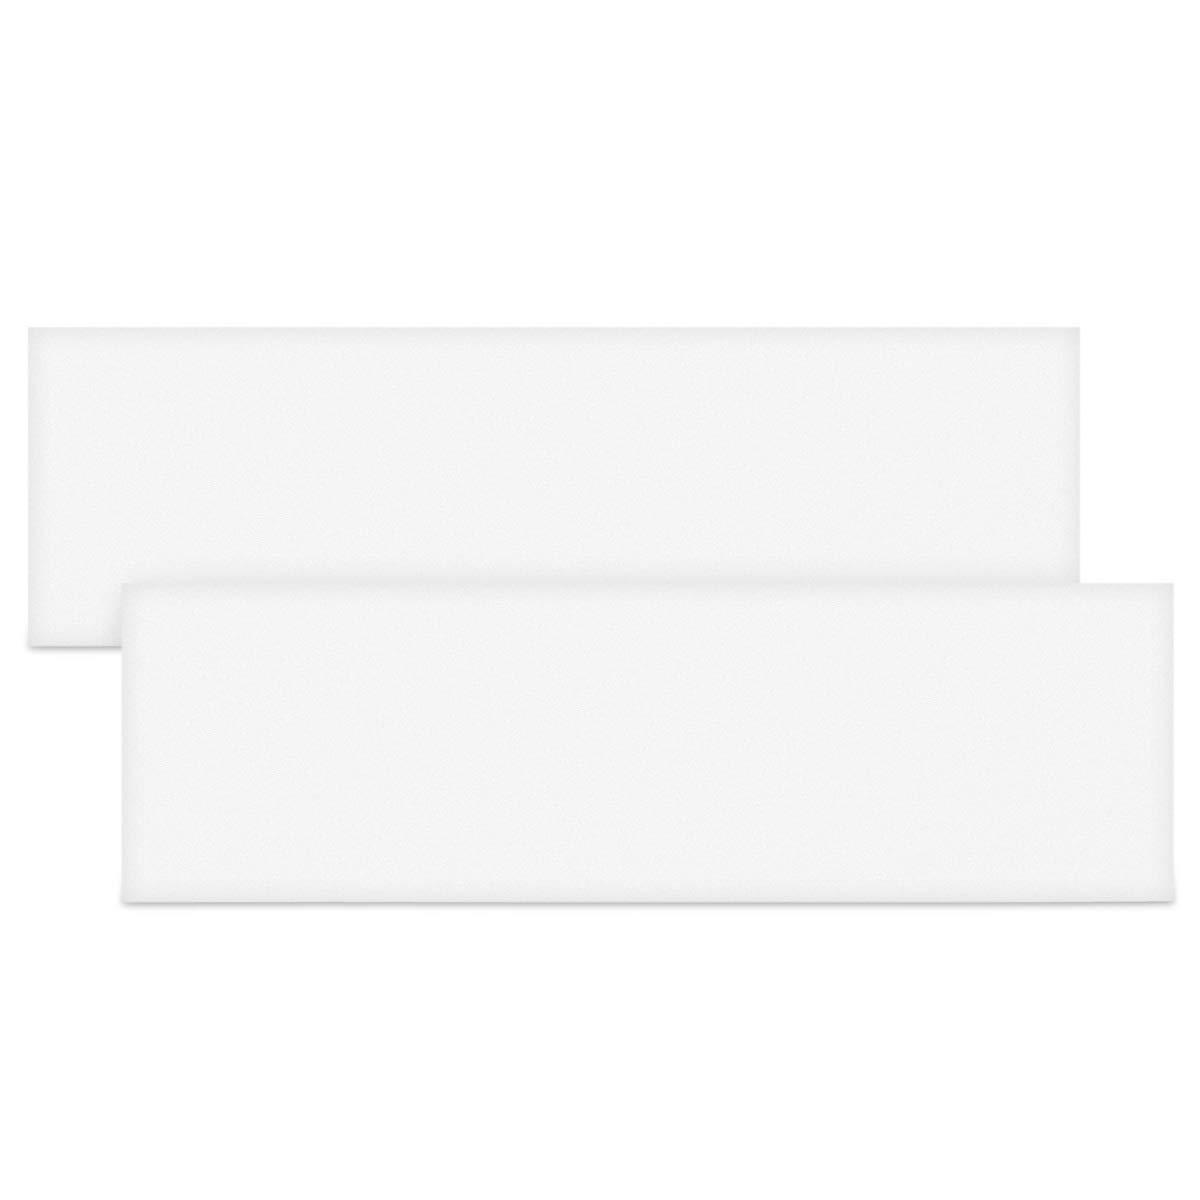 kwmobile Protector de Espuma para Pared de Garaje Parachoques 40 x 12 x 1.5 CM en Gris Set de 4 Protectores para Puerta de Coche